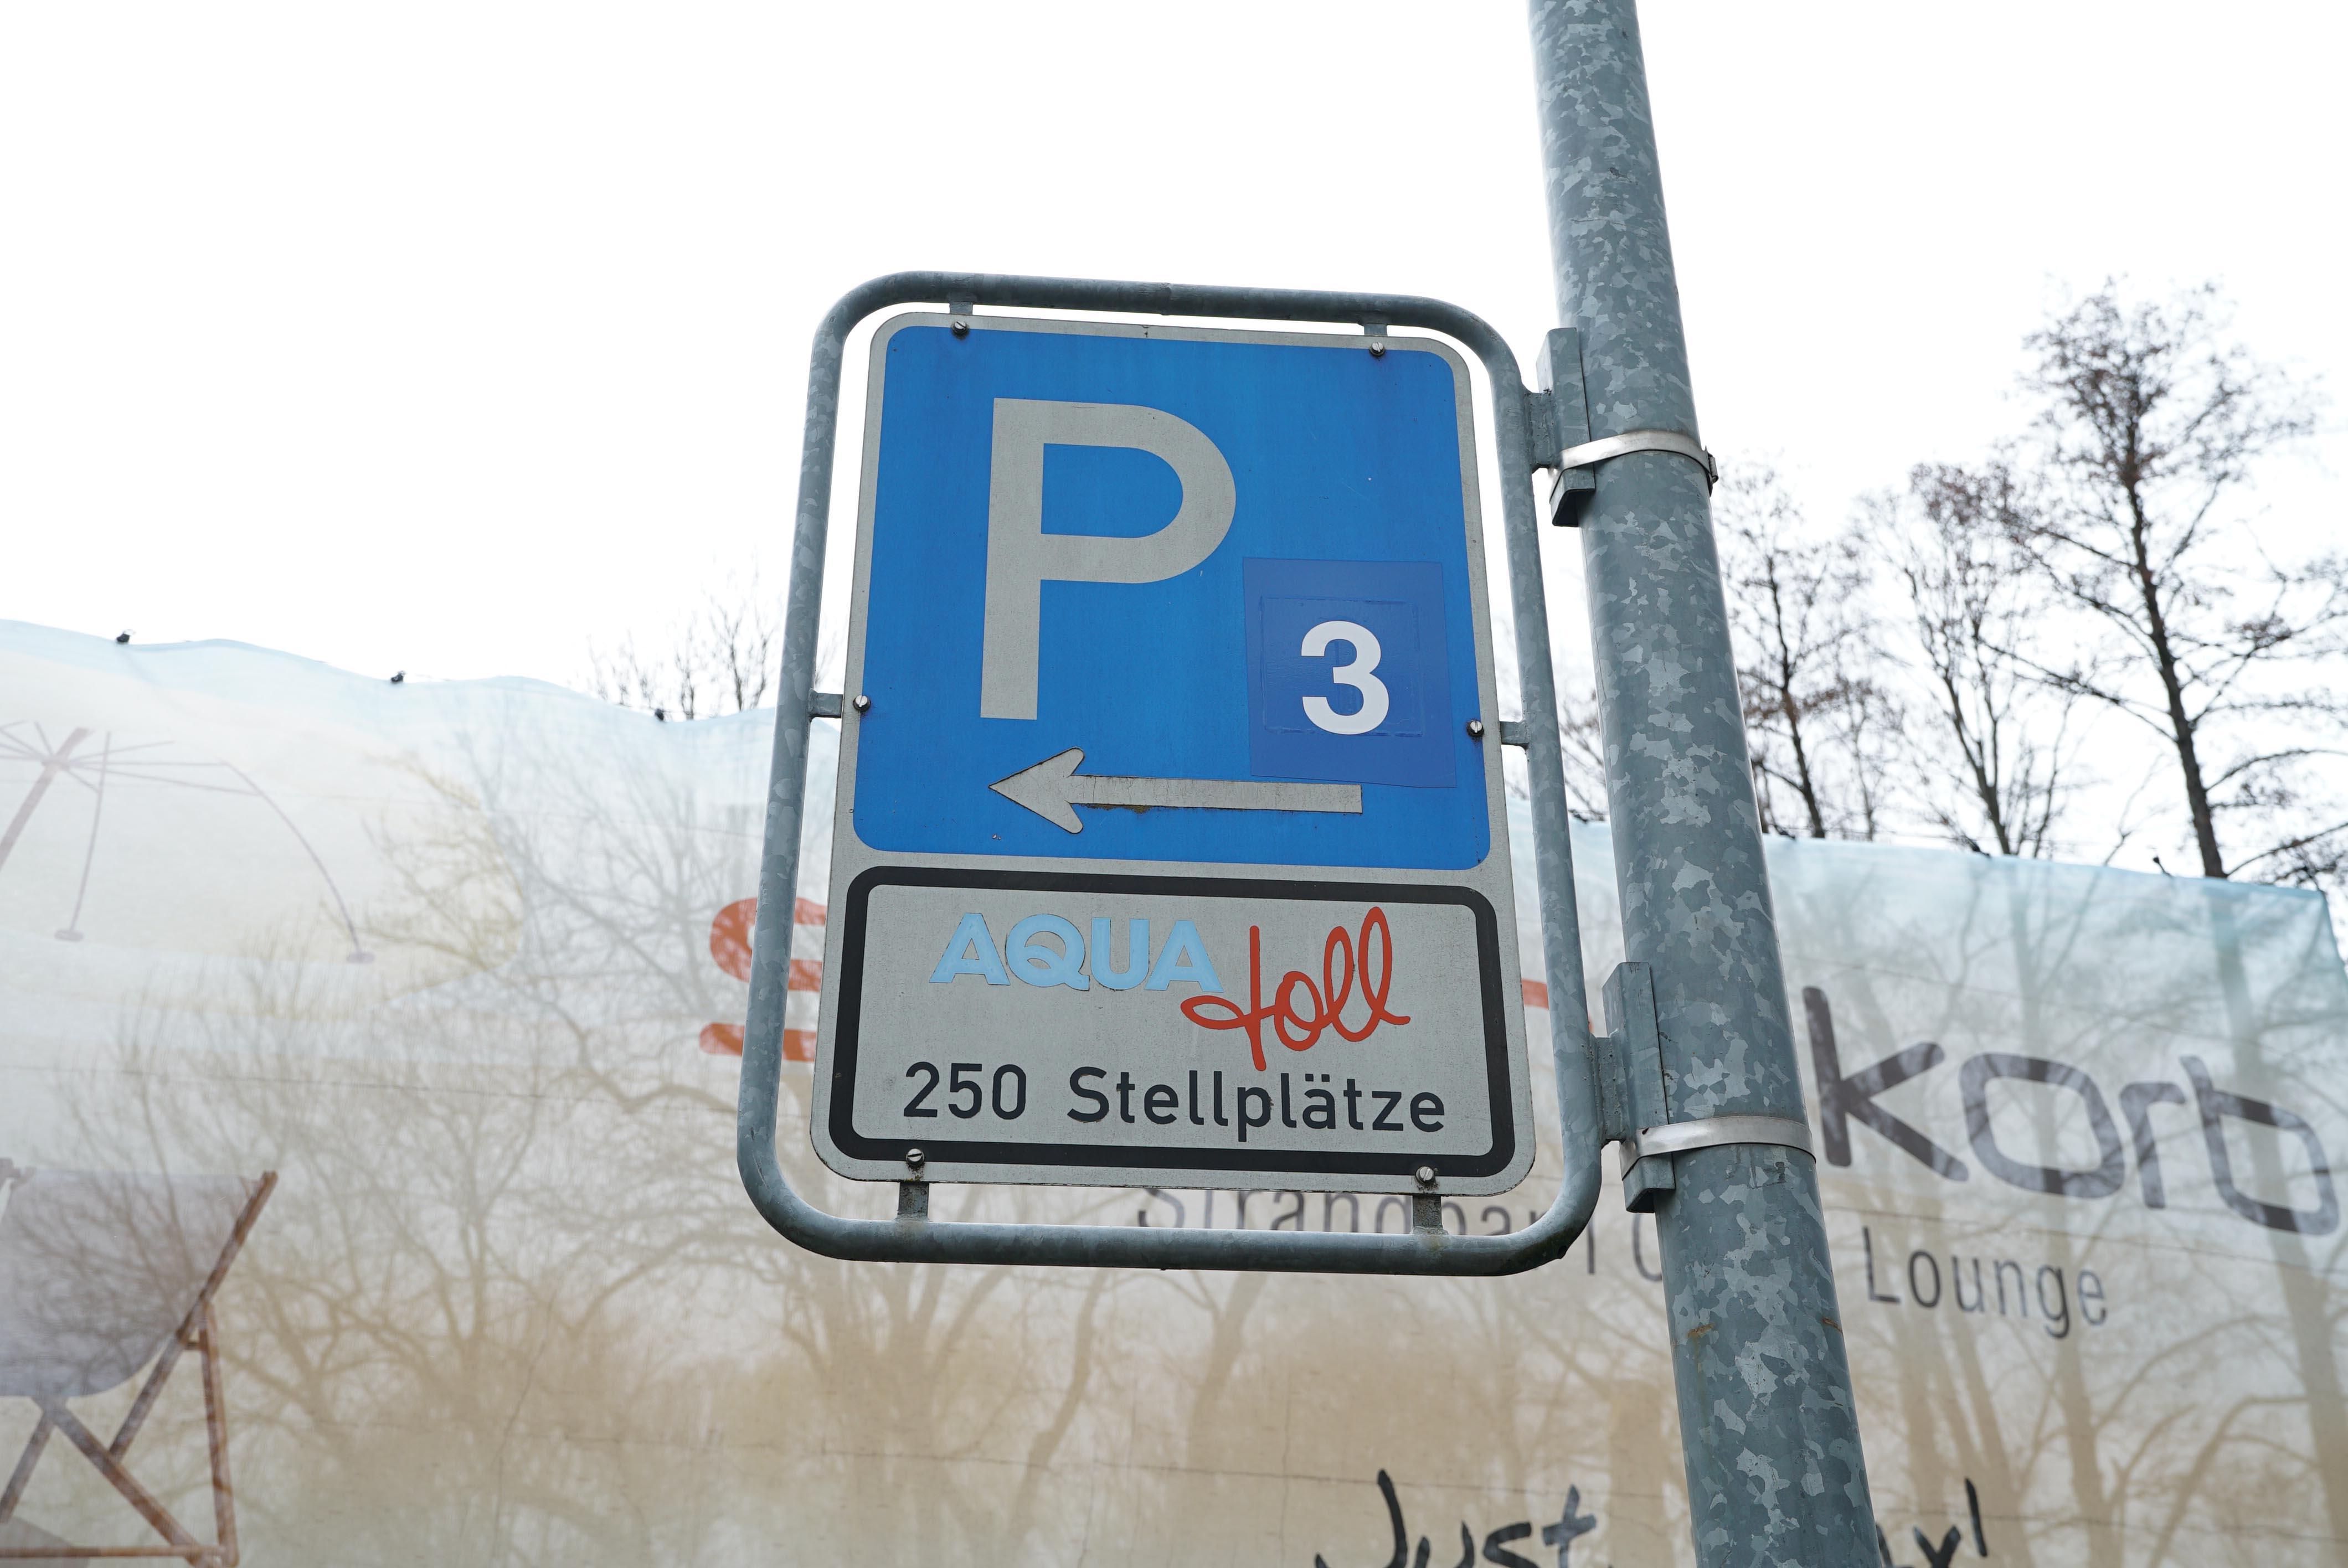 Wohnmobilstellplatz Aquatoll03